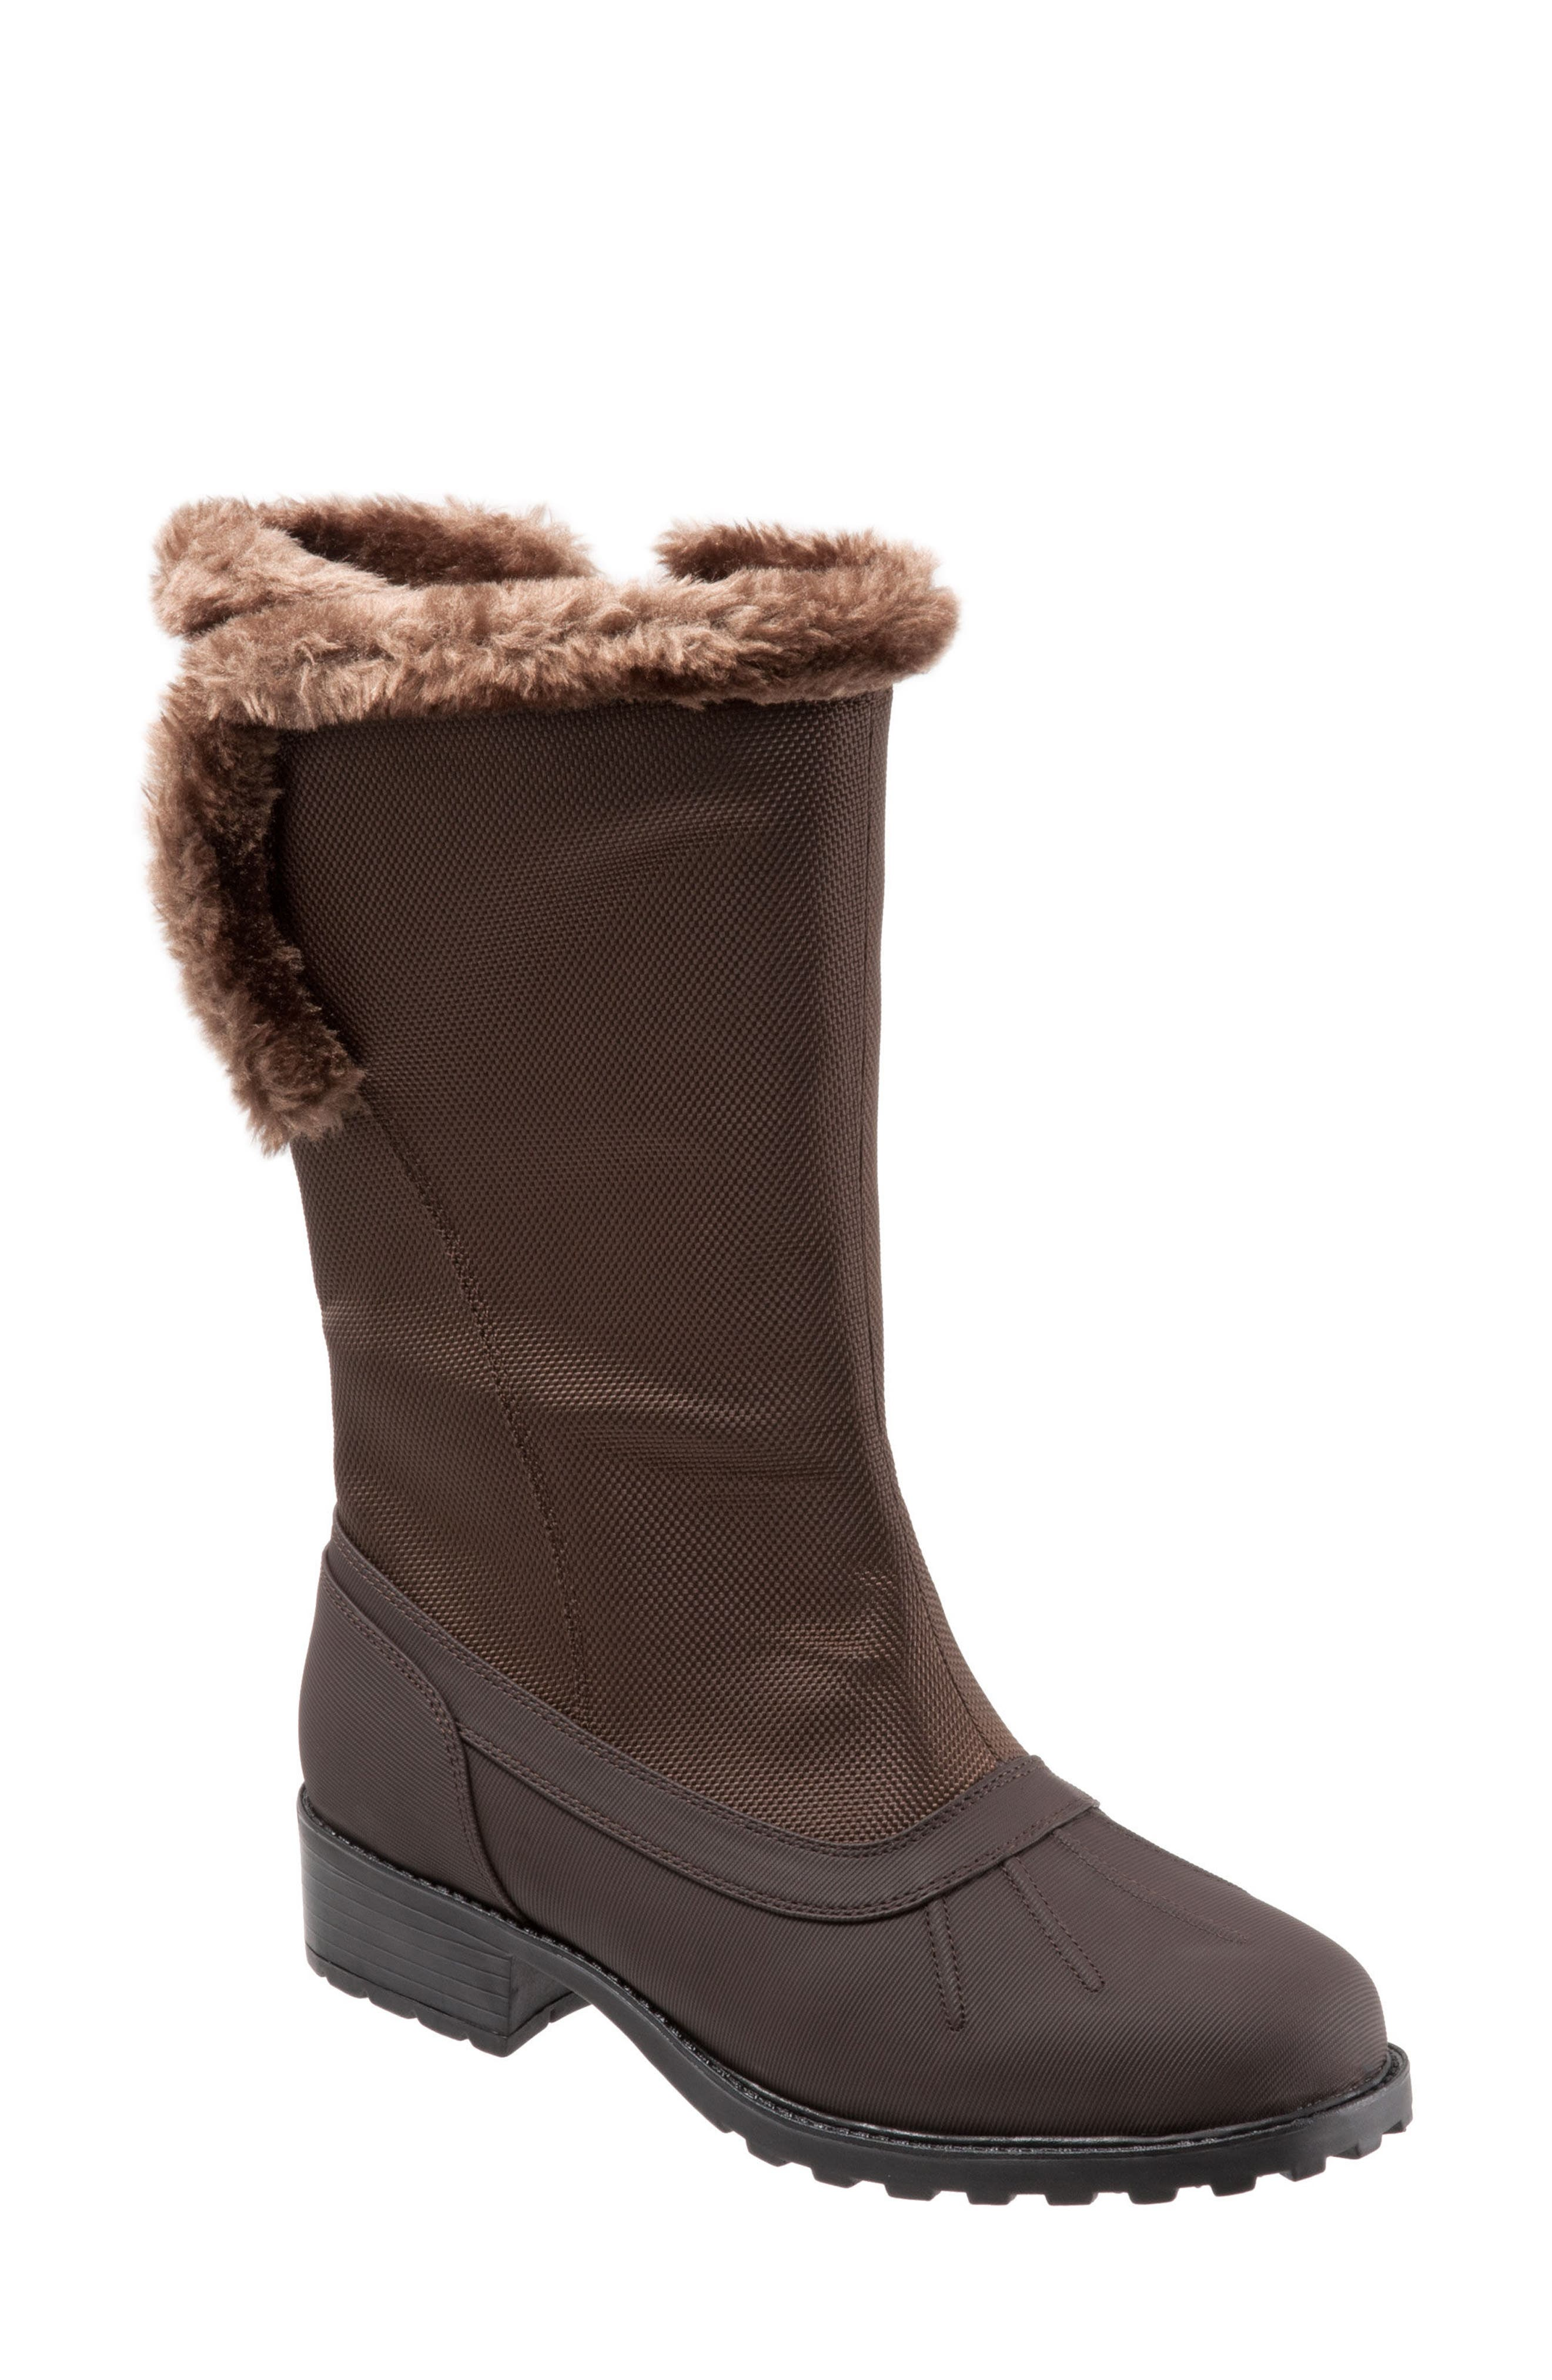 Bowen Waterproof Boot,                         Main,                         color, Dark Brown